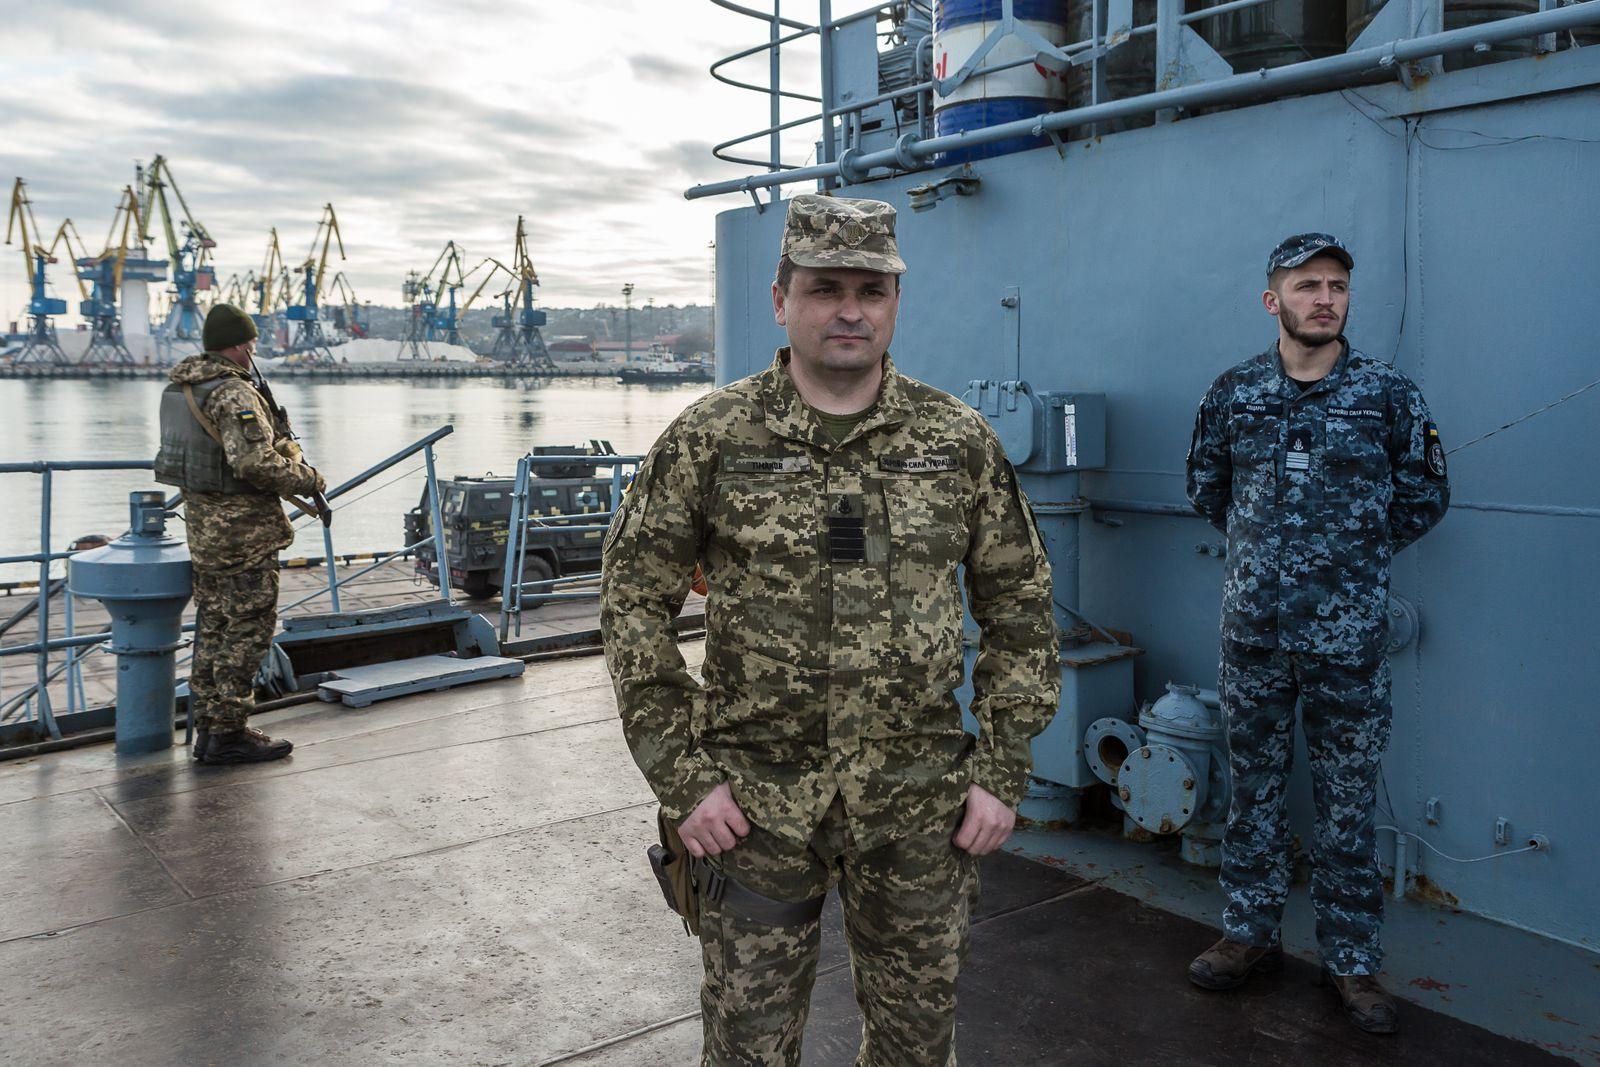 Escalation of the war in eatsern Ukraine